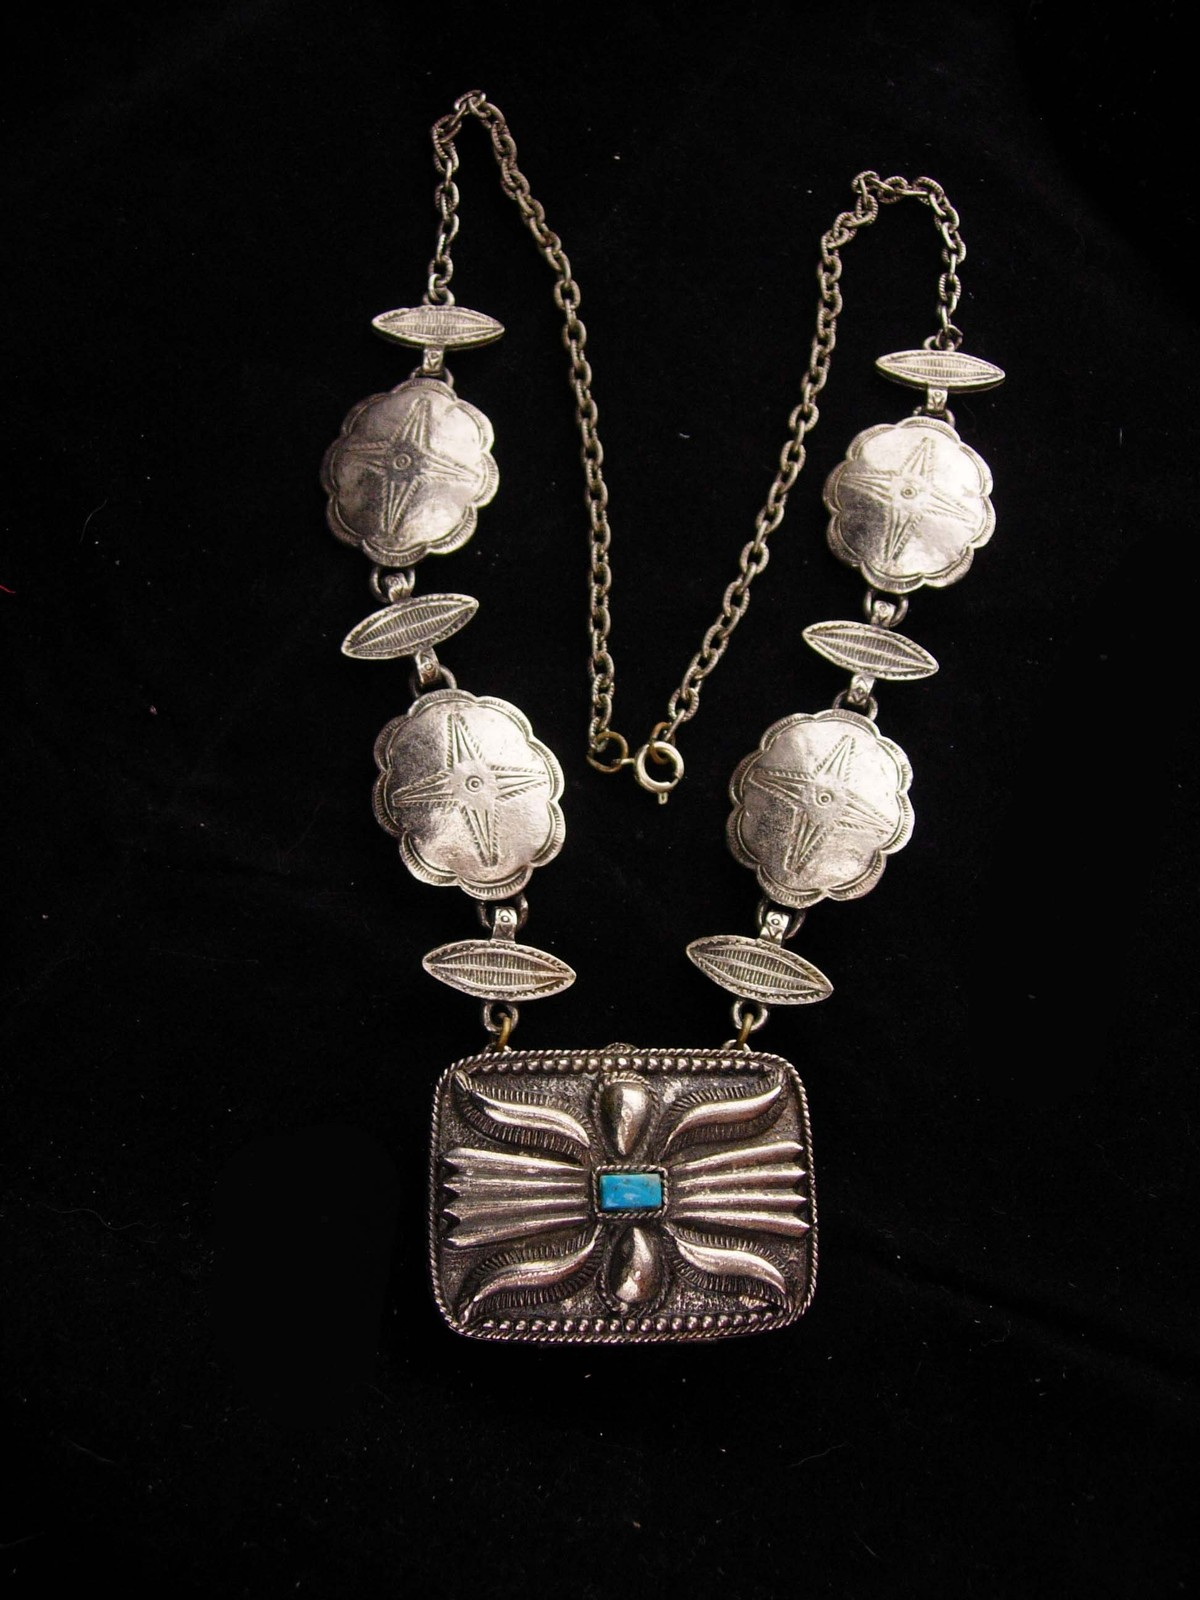 Vintage Perfume Necklace / southwestern concho / Estee lauder / Youth dew solid